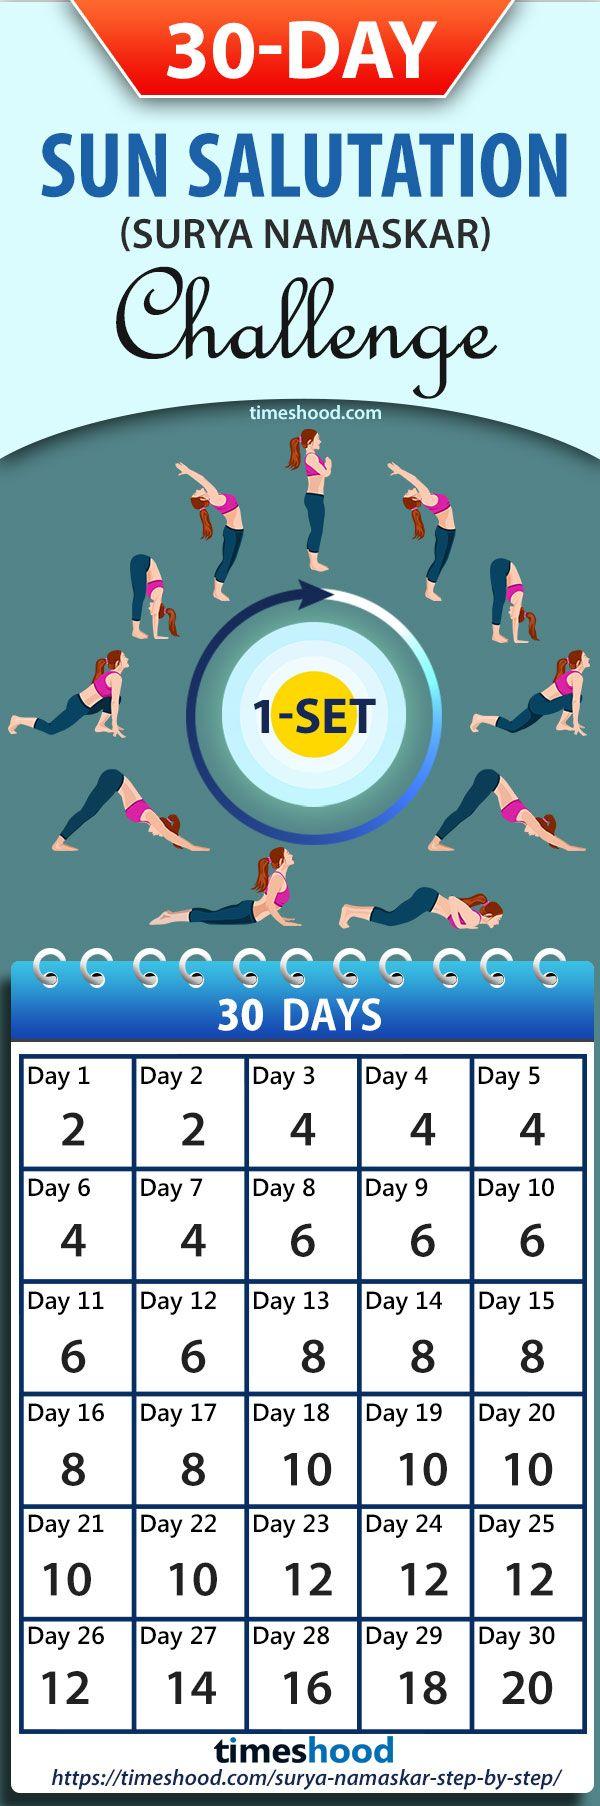 One Of The Best Morning Yoga Workout Sun Salutation Yoga Challenge For 30 Days Do Sun Salutation Yoga P Easy Yoga Workouts Morning Yoga Workouts Morning Yoga